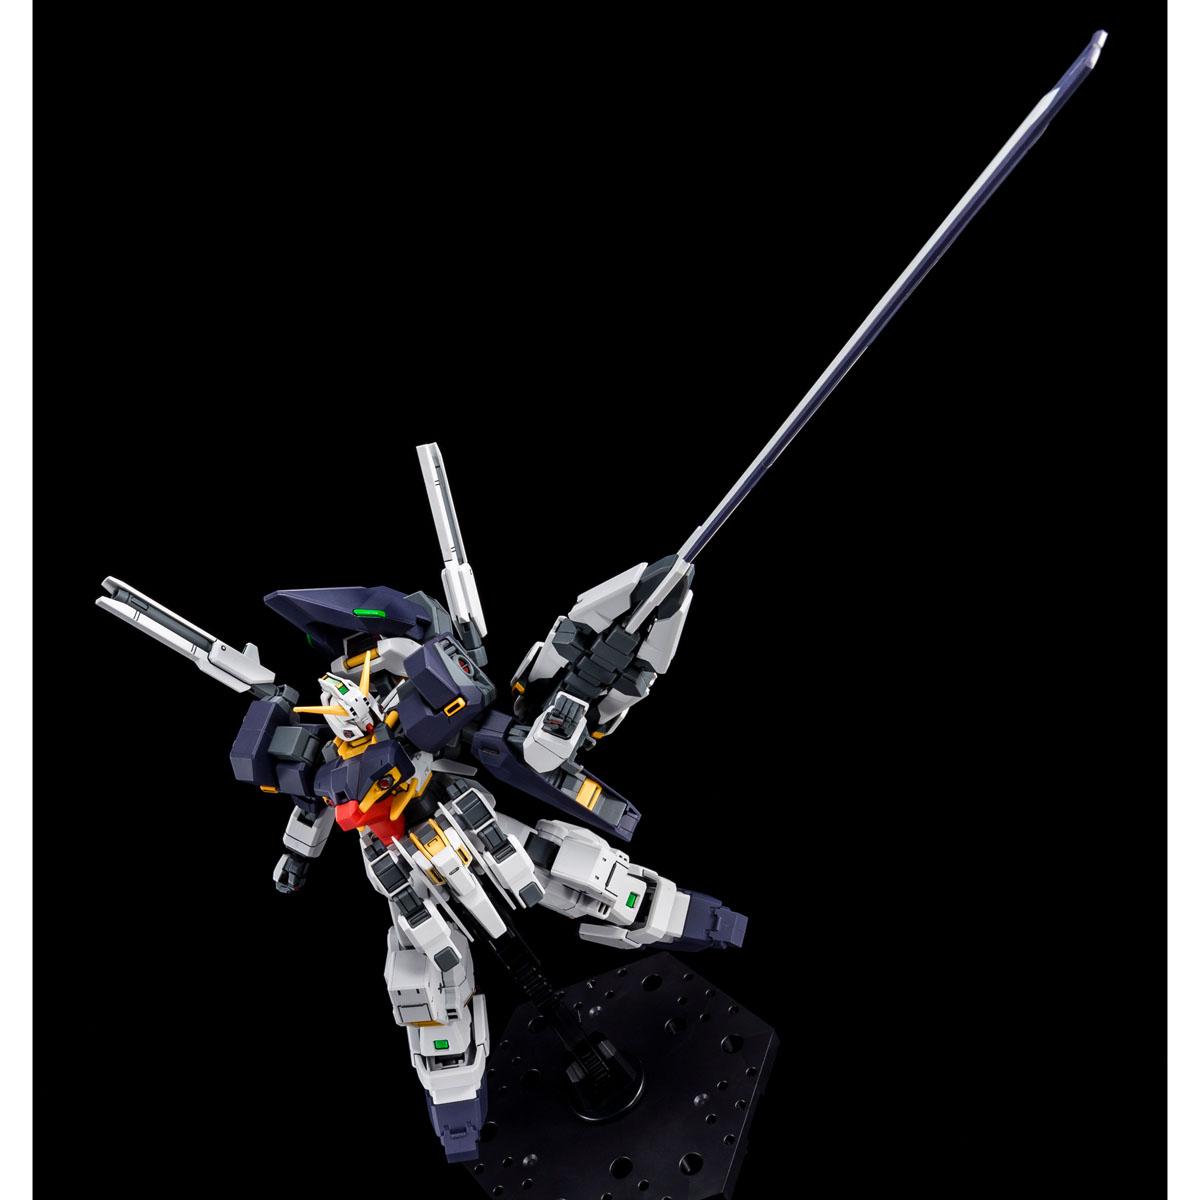 HG 1/144 GUNDAM TR-1 [HAZE'N-THLEY] (ADVANCE OF Z THE FLAG OF TITANS)